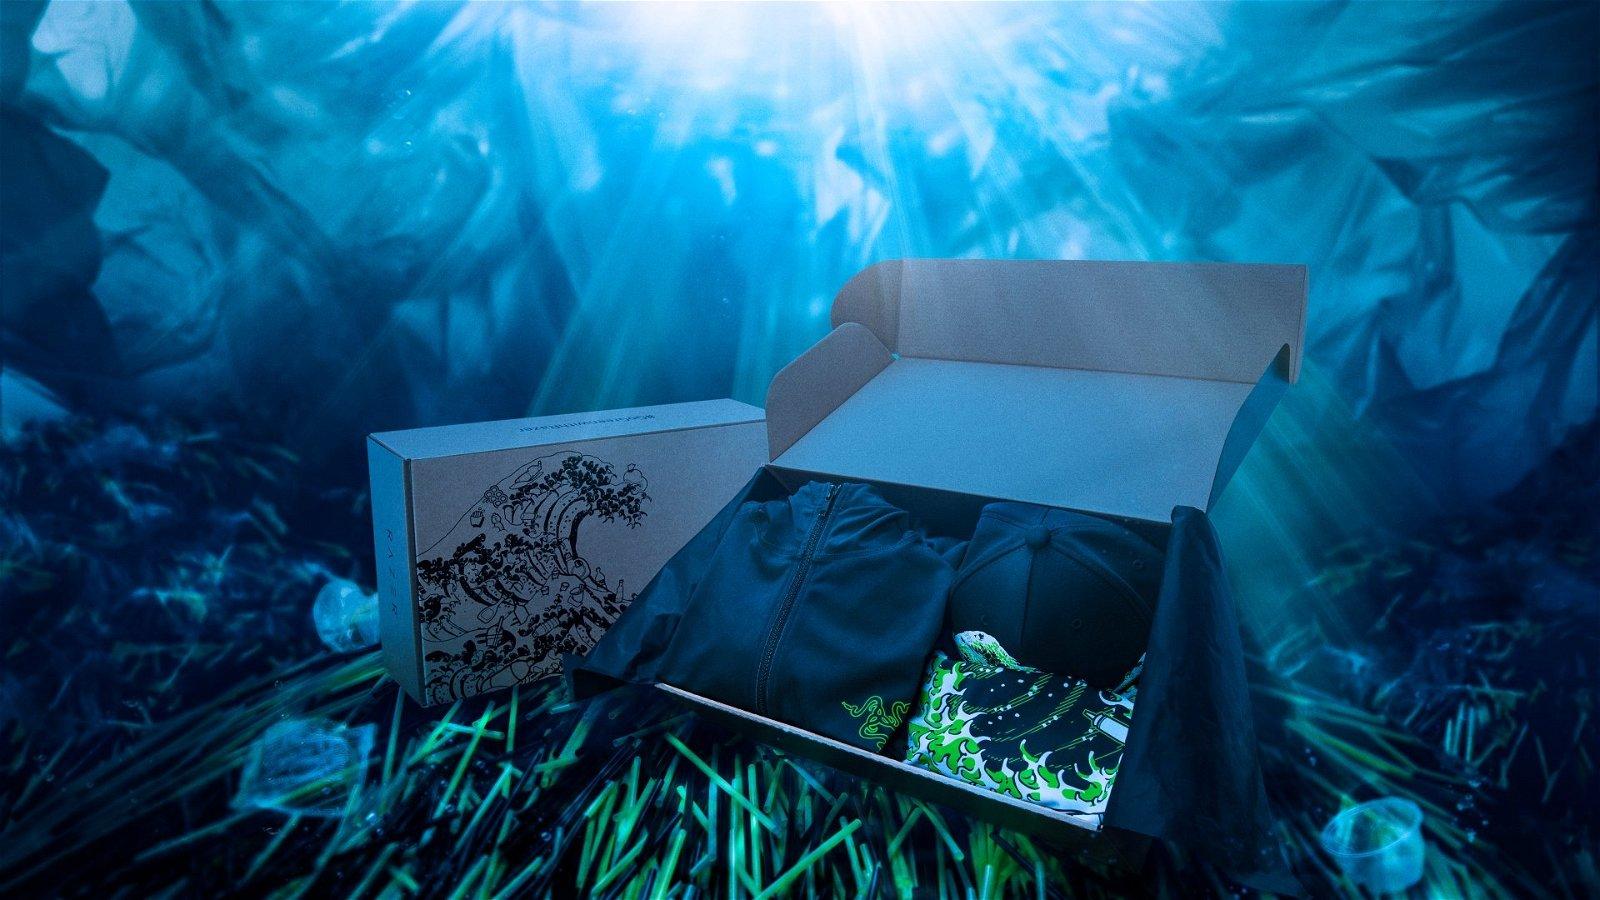 Razer Announces New Streetwear Brand